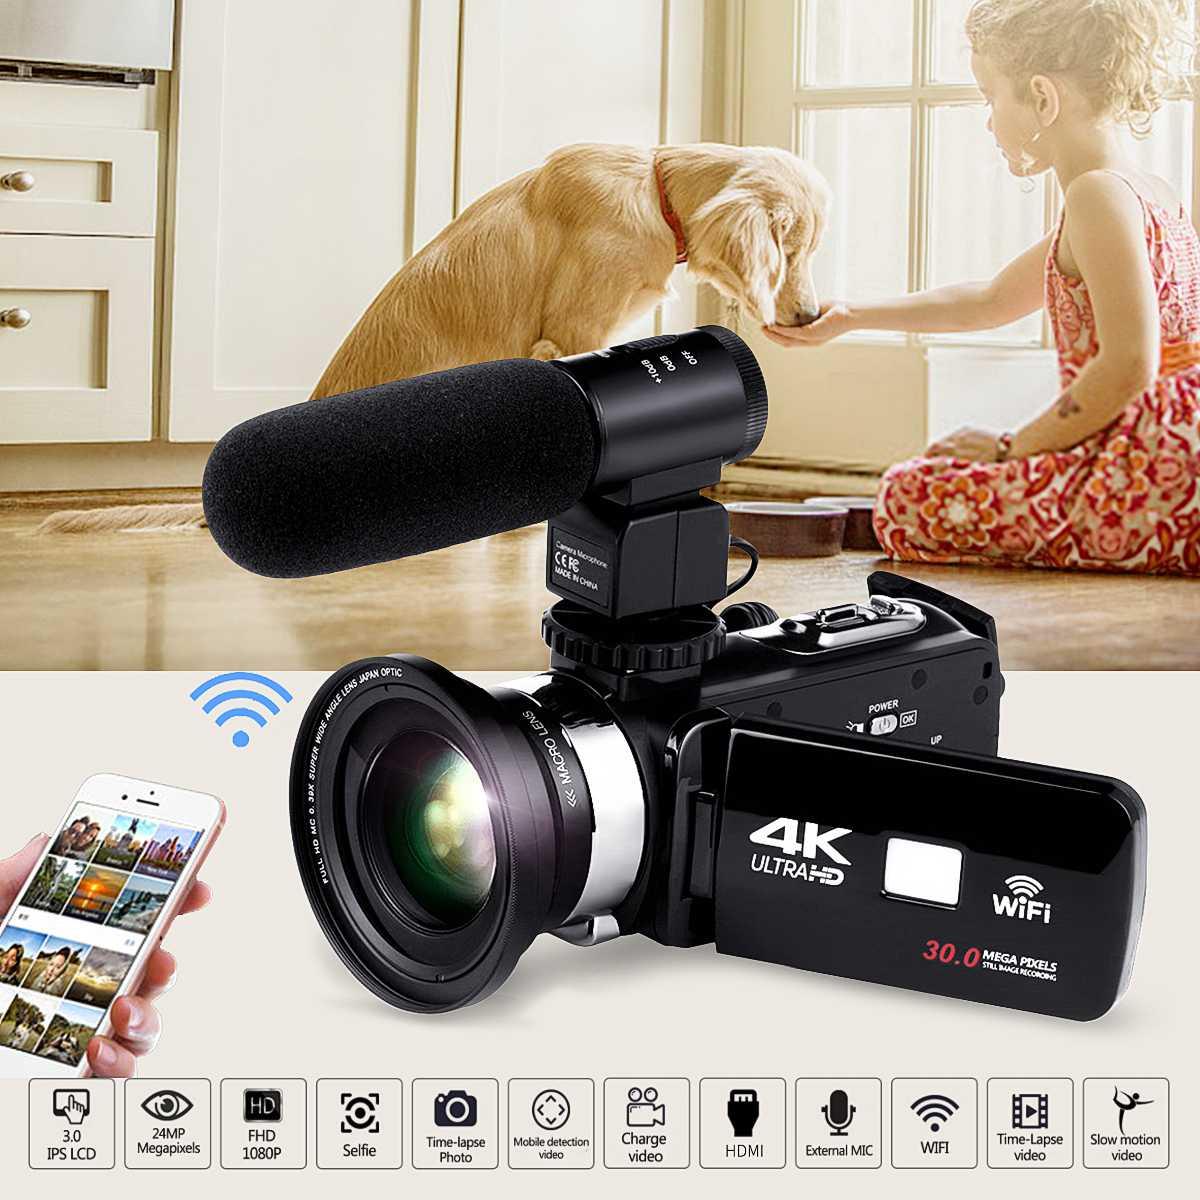 4K WiFi Ultras HD 1080P CMOS 12 миллионов пикселей Цифровая видеокамера DV + объектив + микрофон